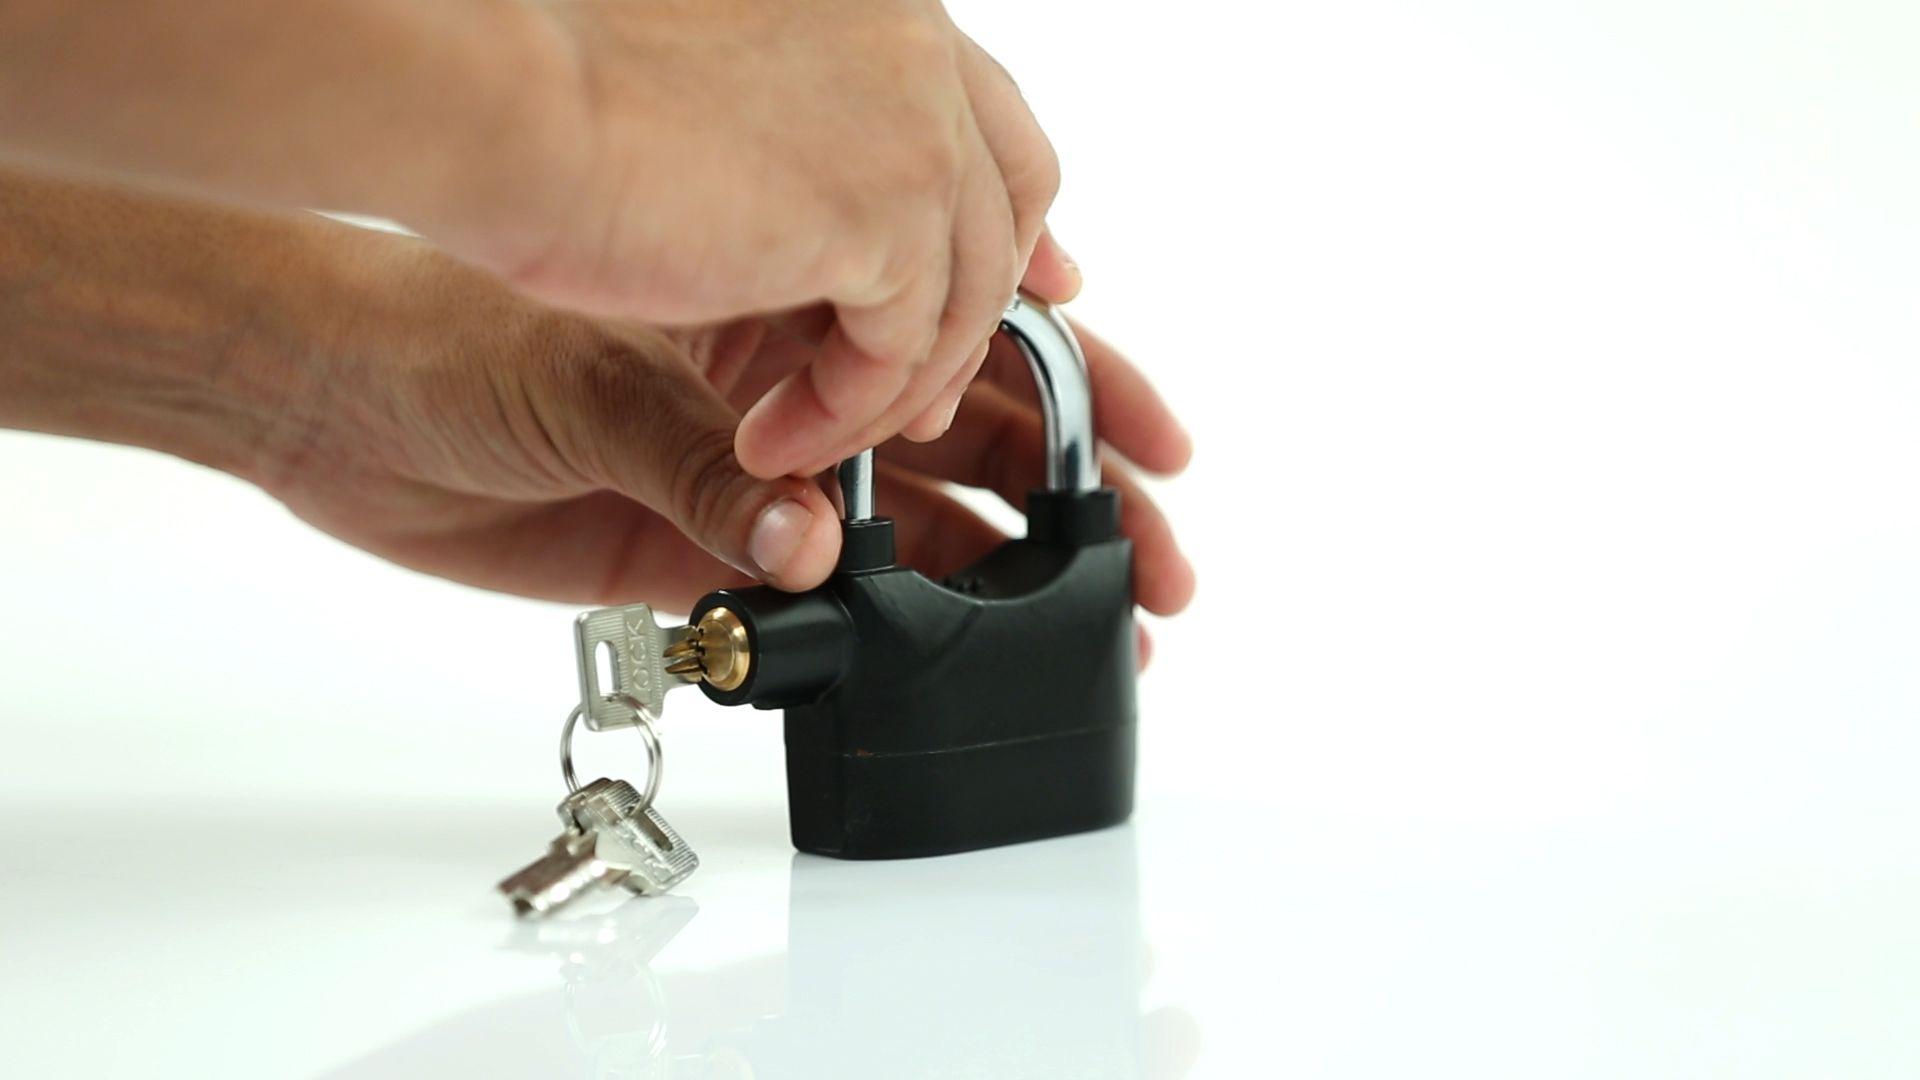 Buy James Bond Anti Theft Motion Sensor Alarm Pad Lock For Bike